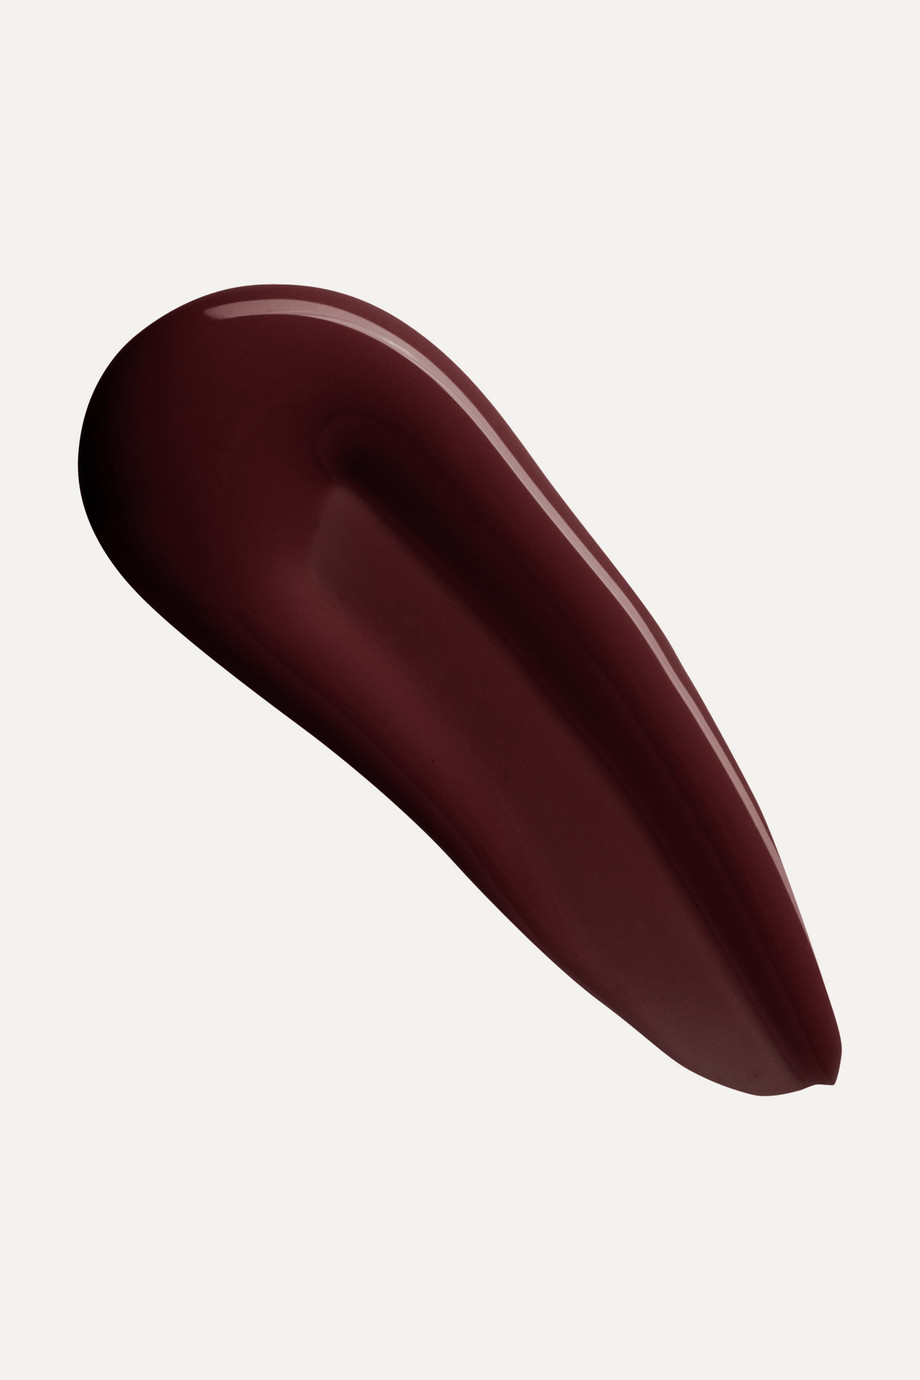 Surratt Beauty Lip Lustre – Trés Chic 13 – Lipgloss